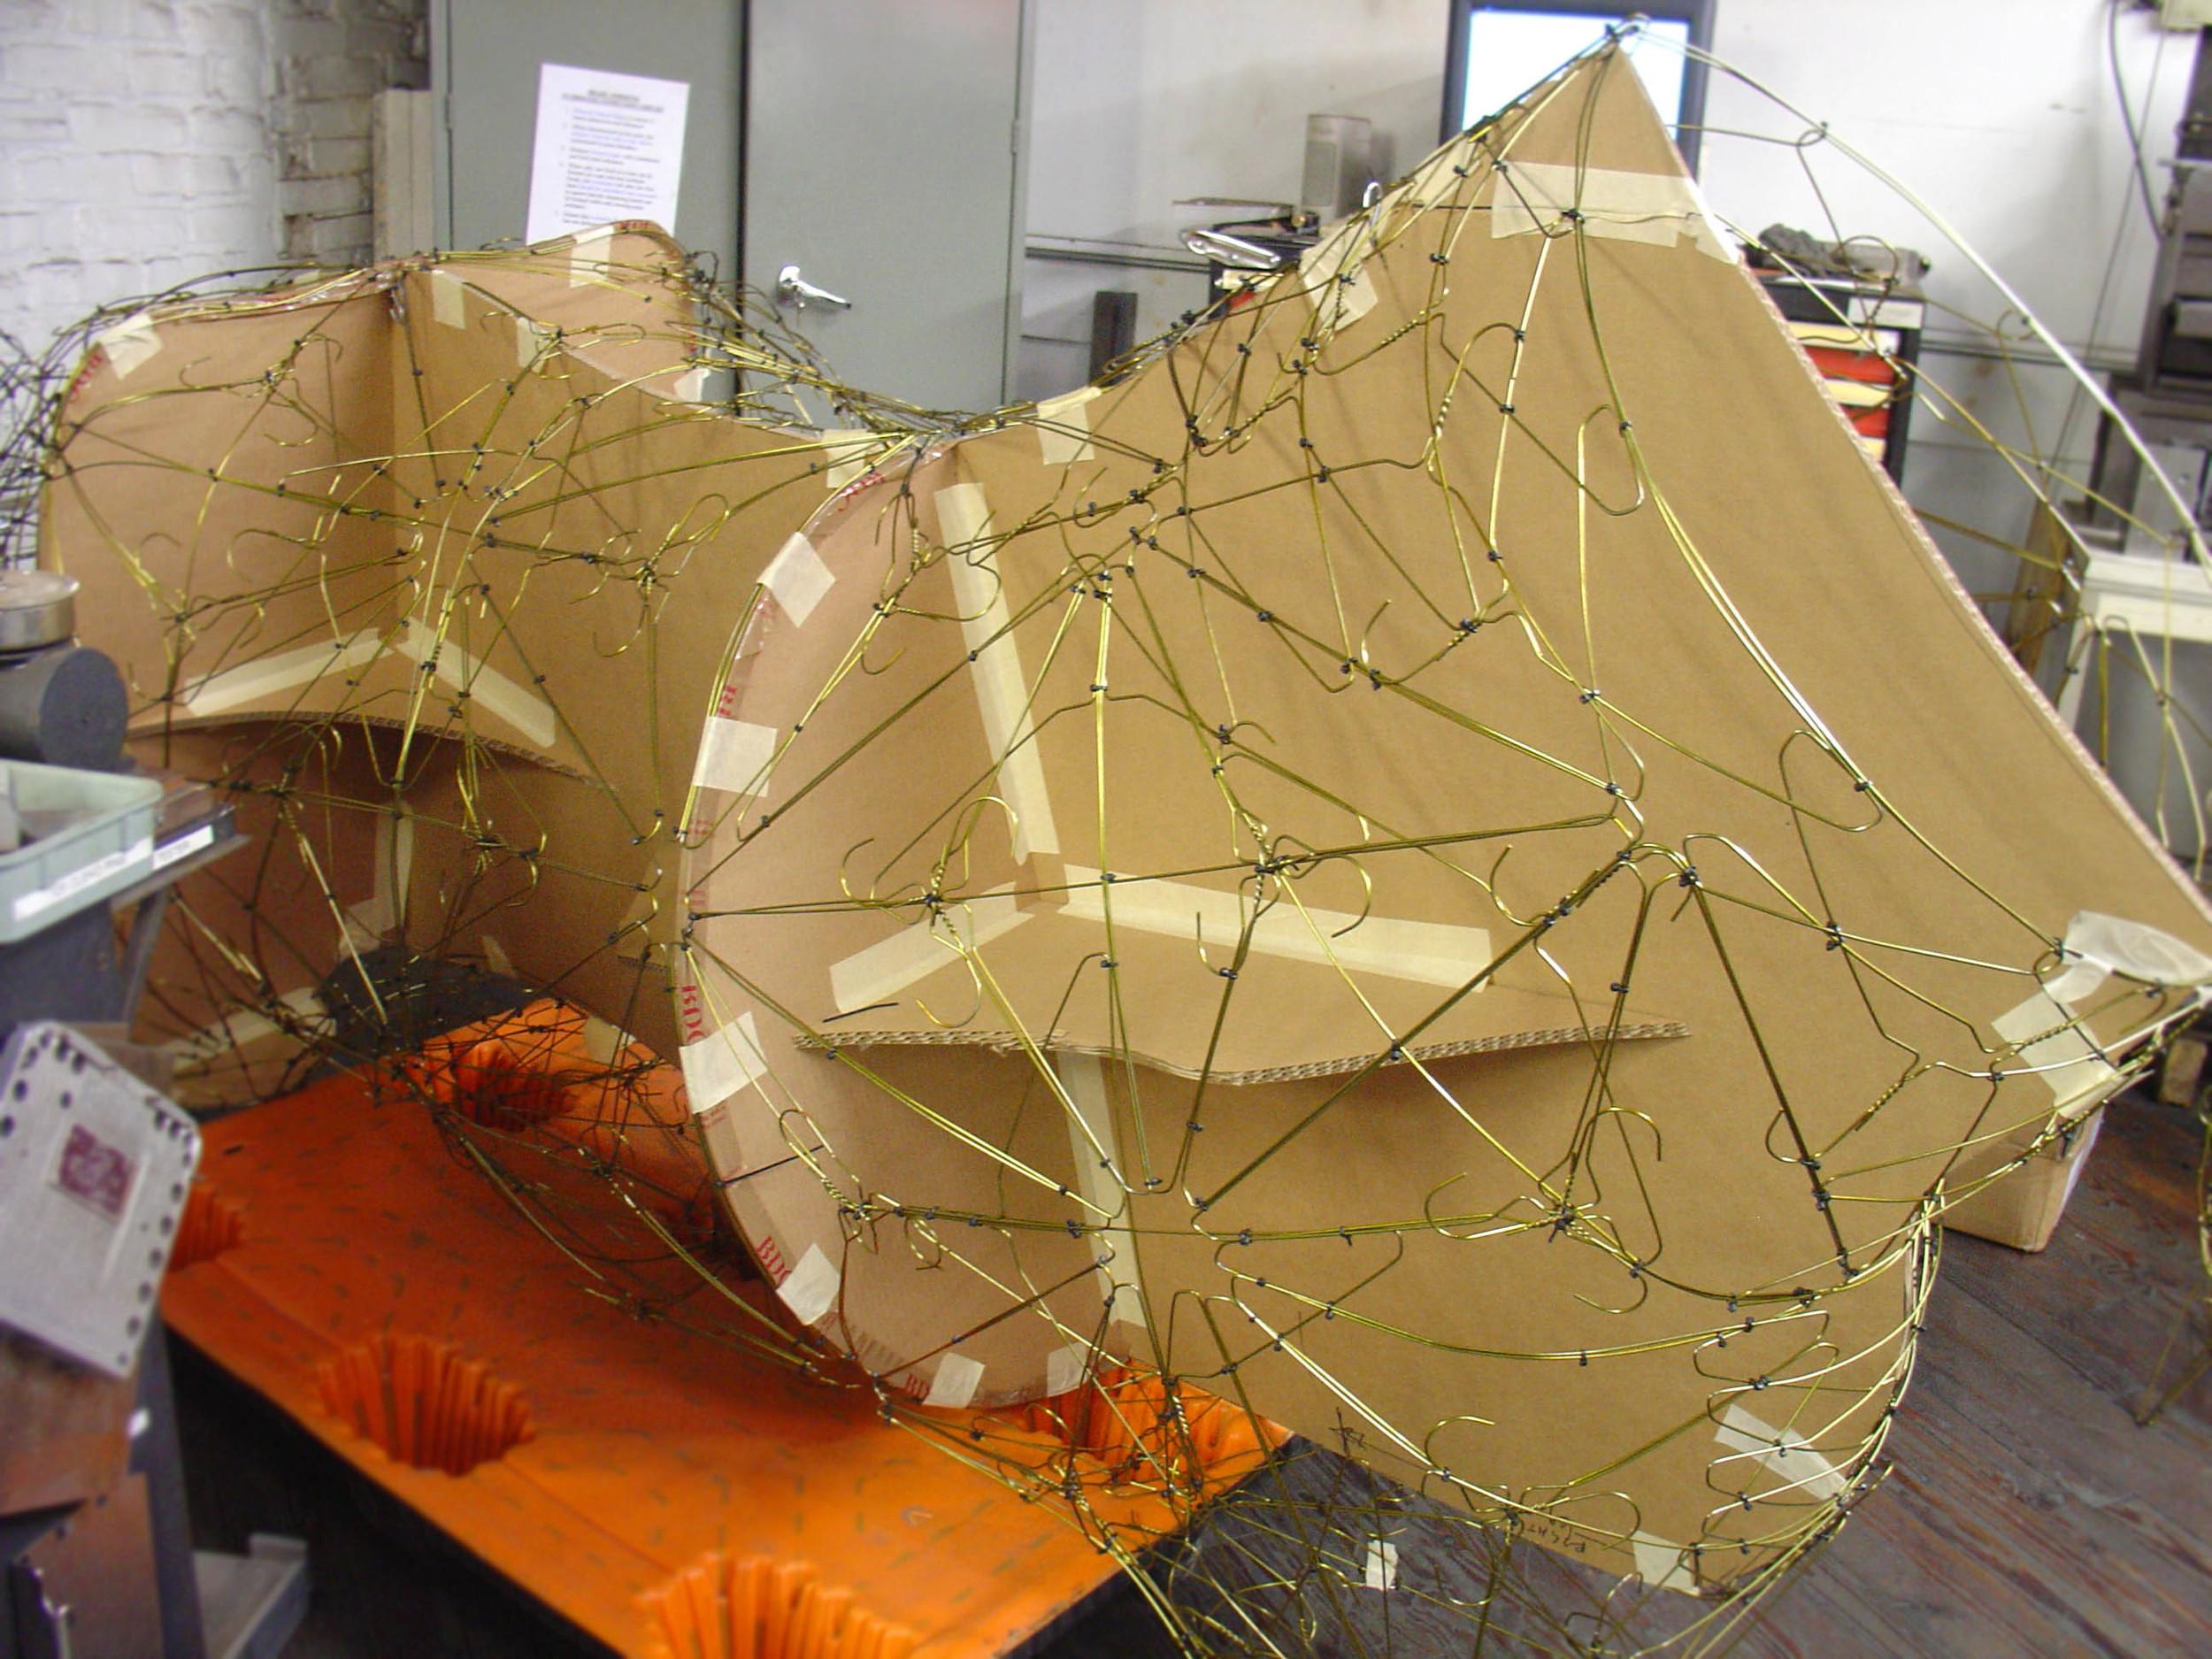 Barneys Hanger Horse in progress_02a.jpg